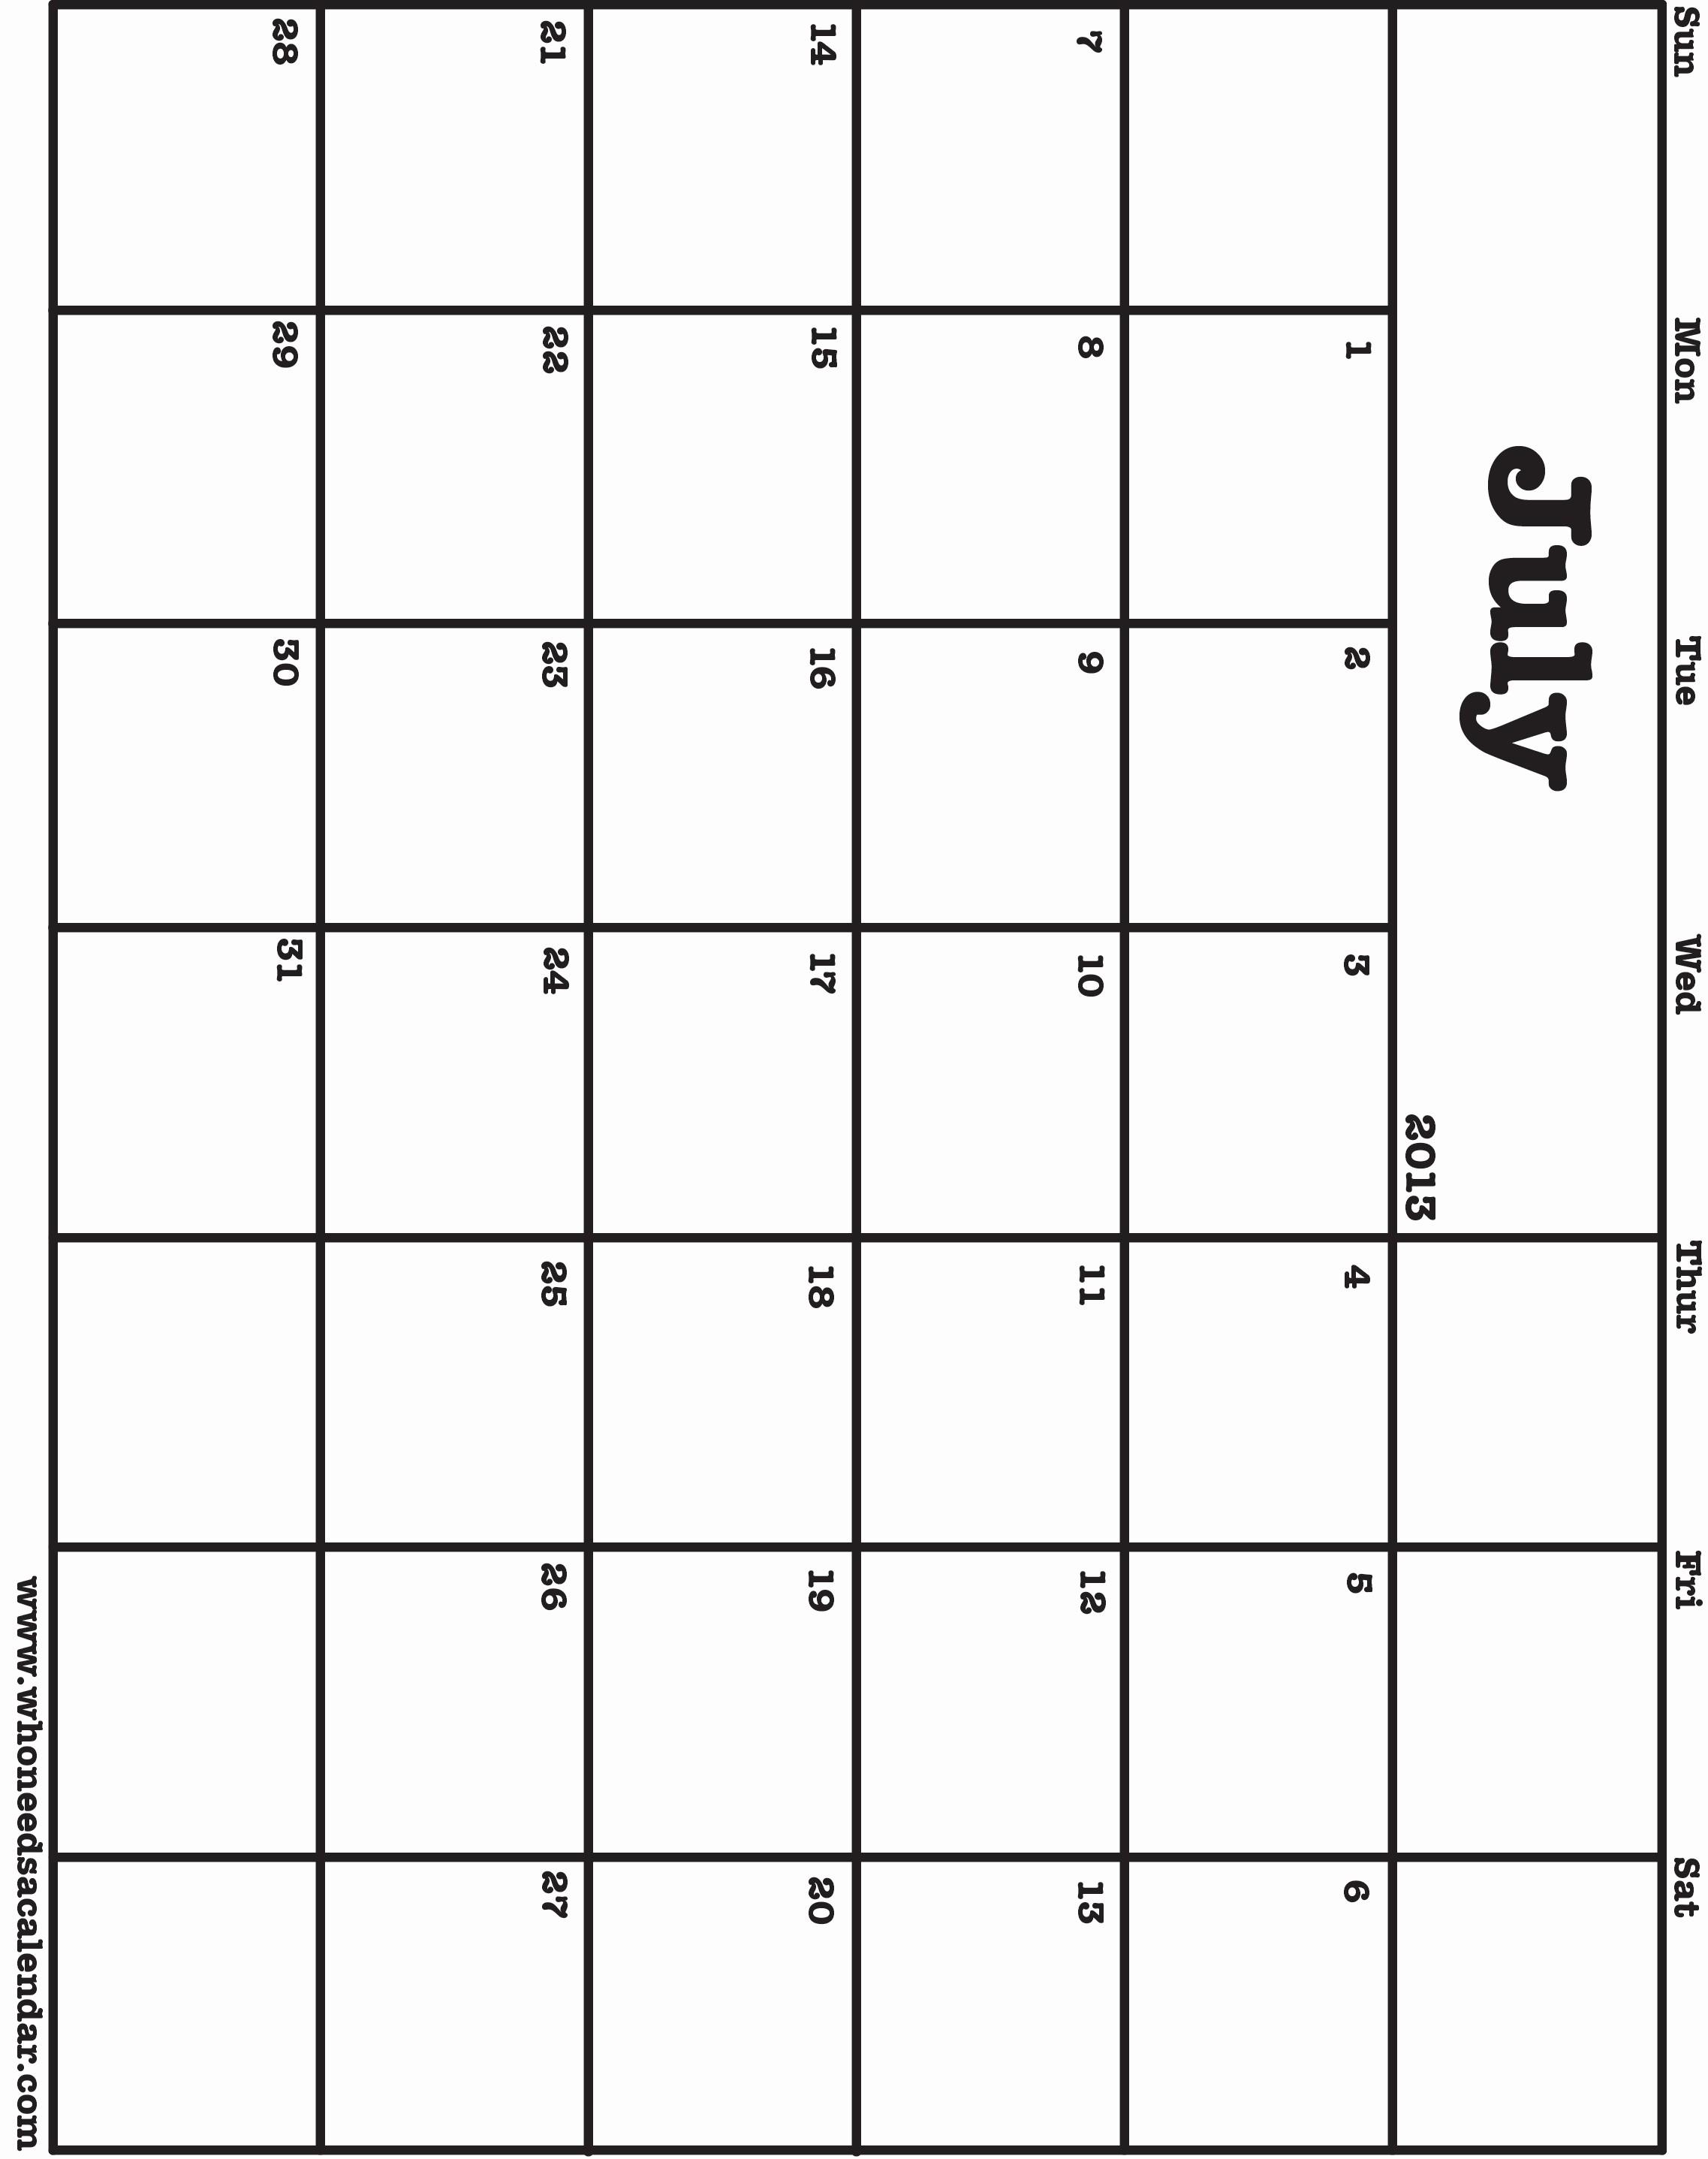 Free Blank Printable Calendar 2017 Awesome Print A Blank Calendar – 2017 Printable Calendar